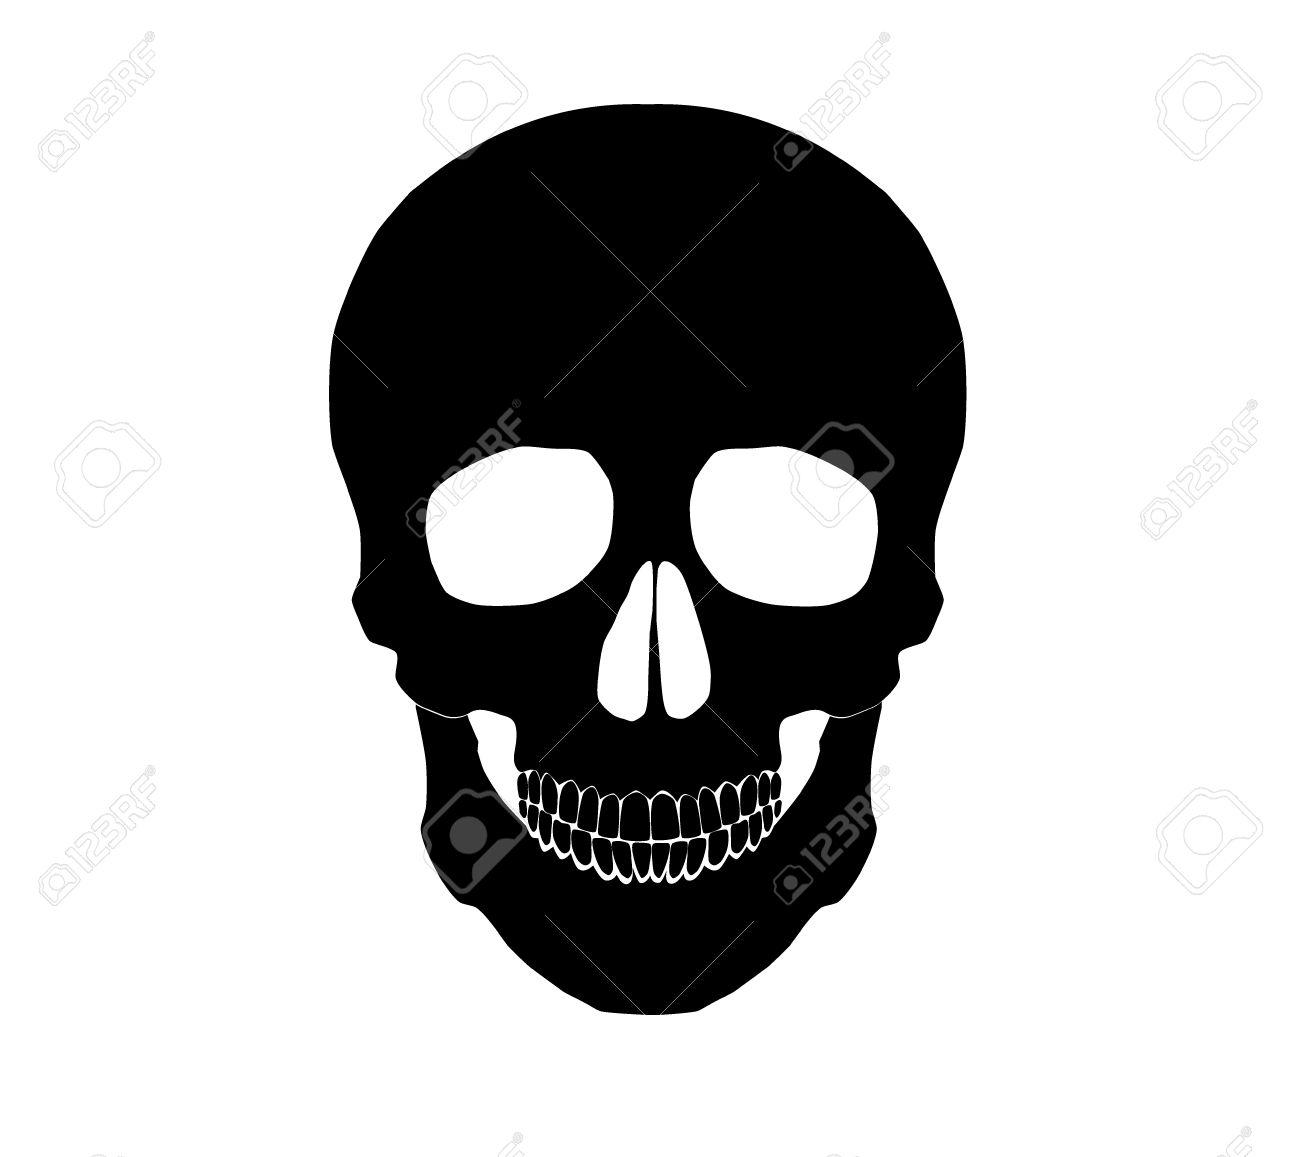 Silhouette Illustration of a human skull. - 31104825